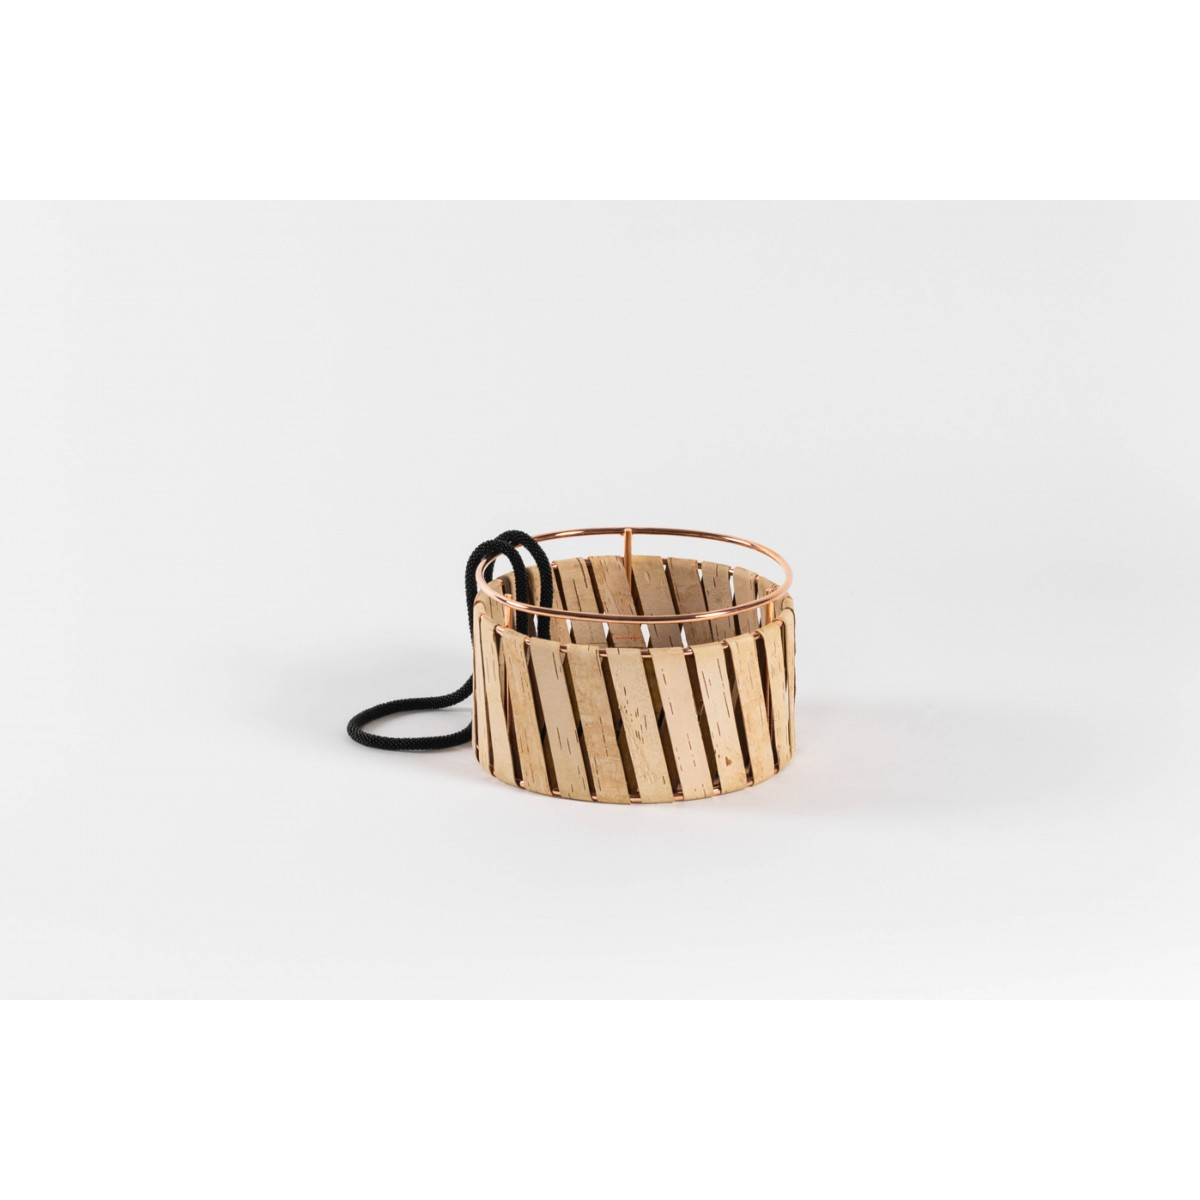 MOYA Körbe aus Birkenrinde Korob BA20 | Copper | Size S